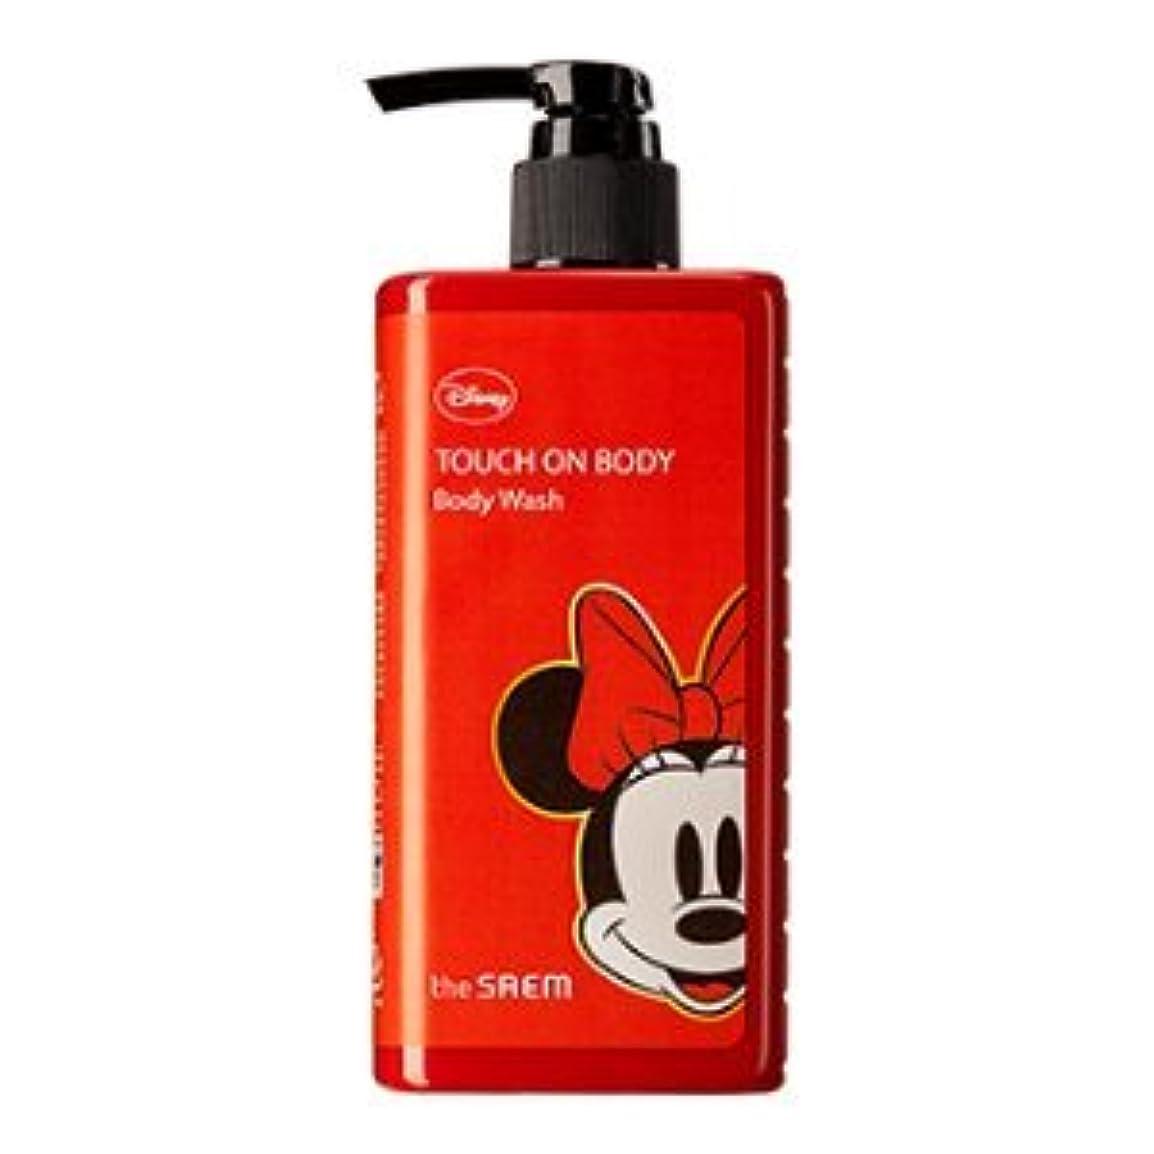 (The Saem X Disney )Touch On Body Acerola Body Wash 300ml / ザセム タッチオンボディーアセロラボディーウォッシュ (ディズニーエディション) [並行輸入品]